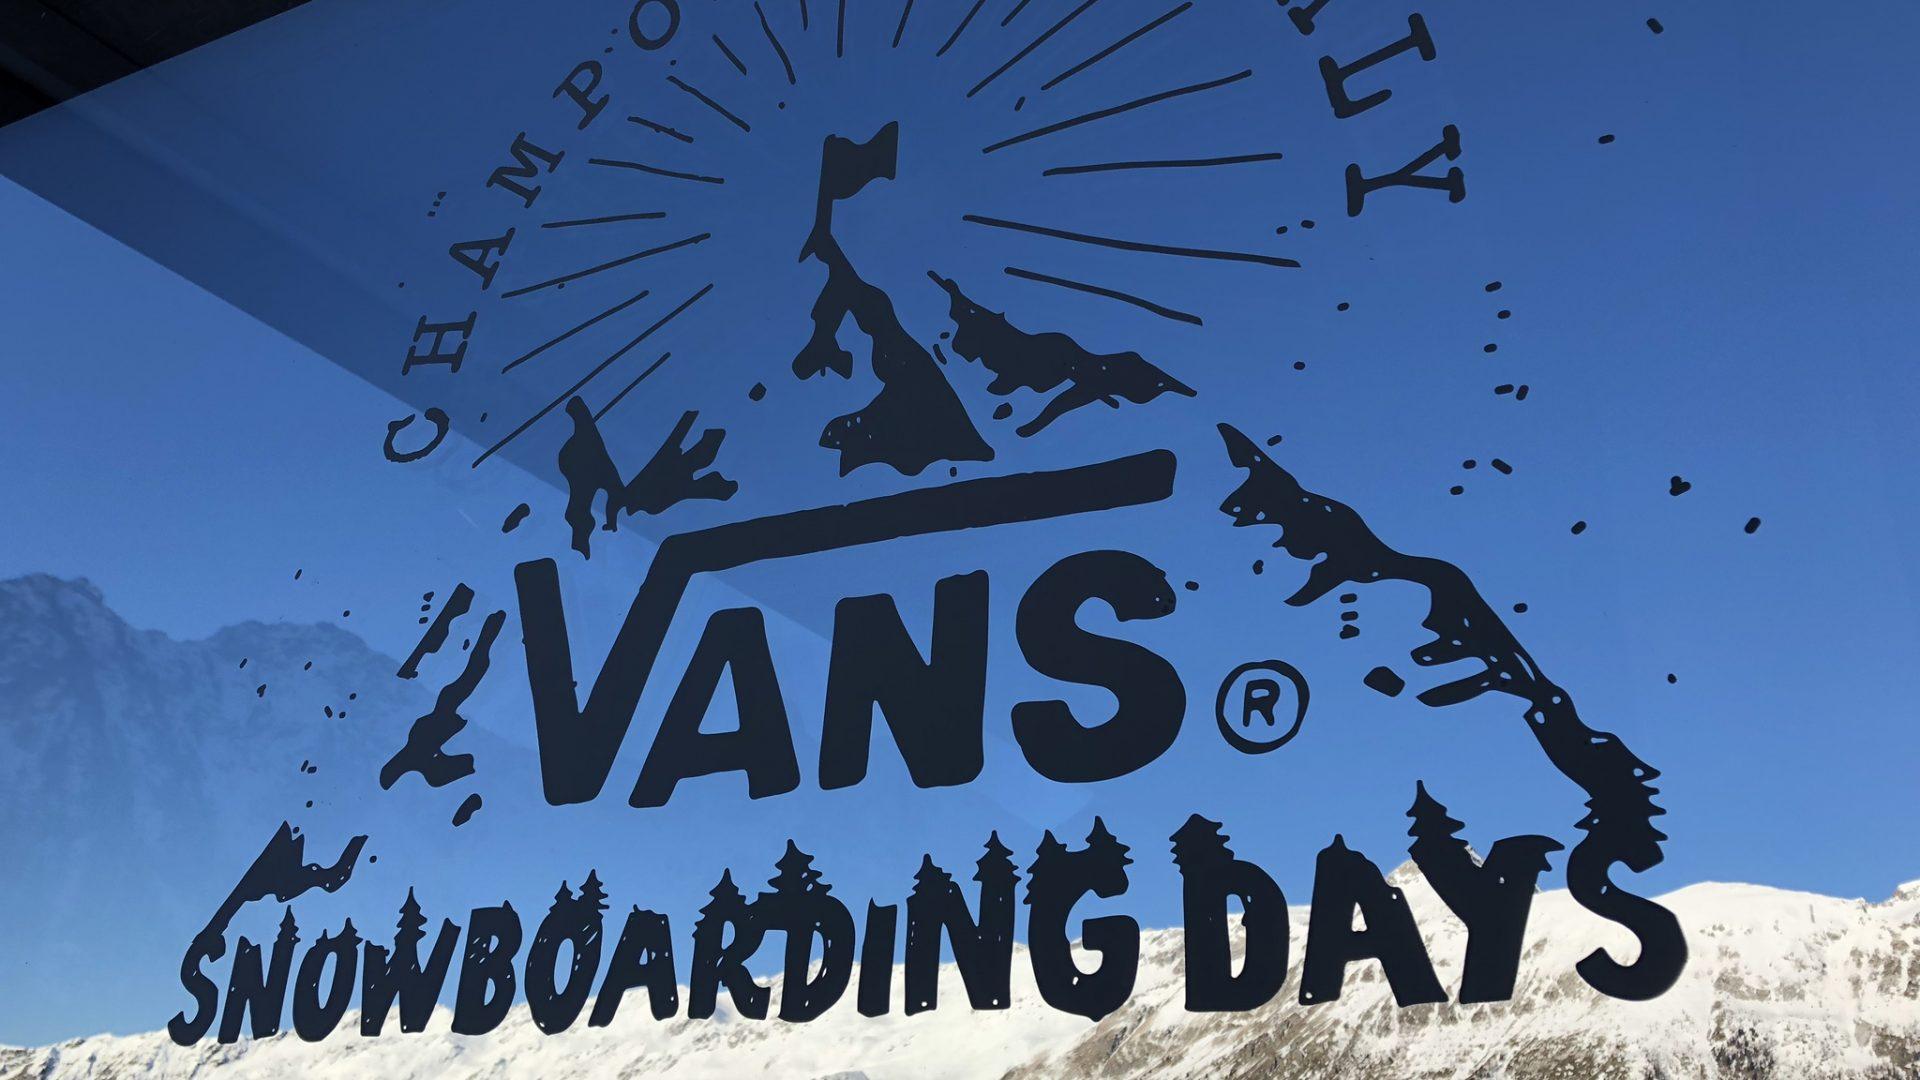 Vans Snowboarding Days 2019. Champoluc, Italy